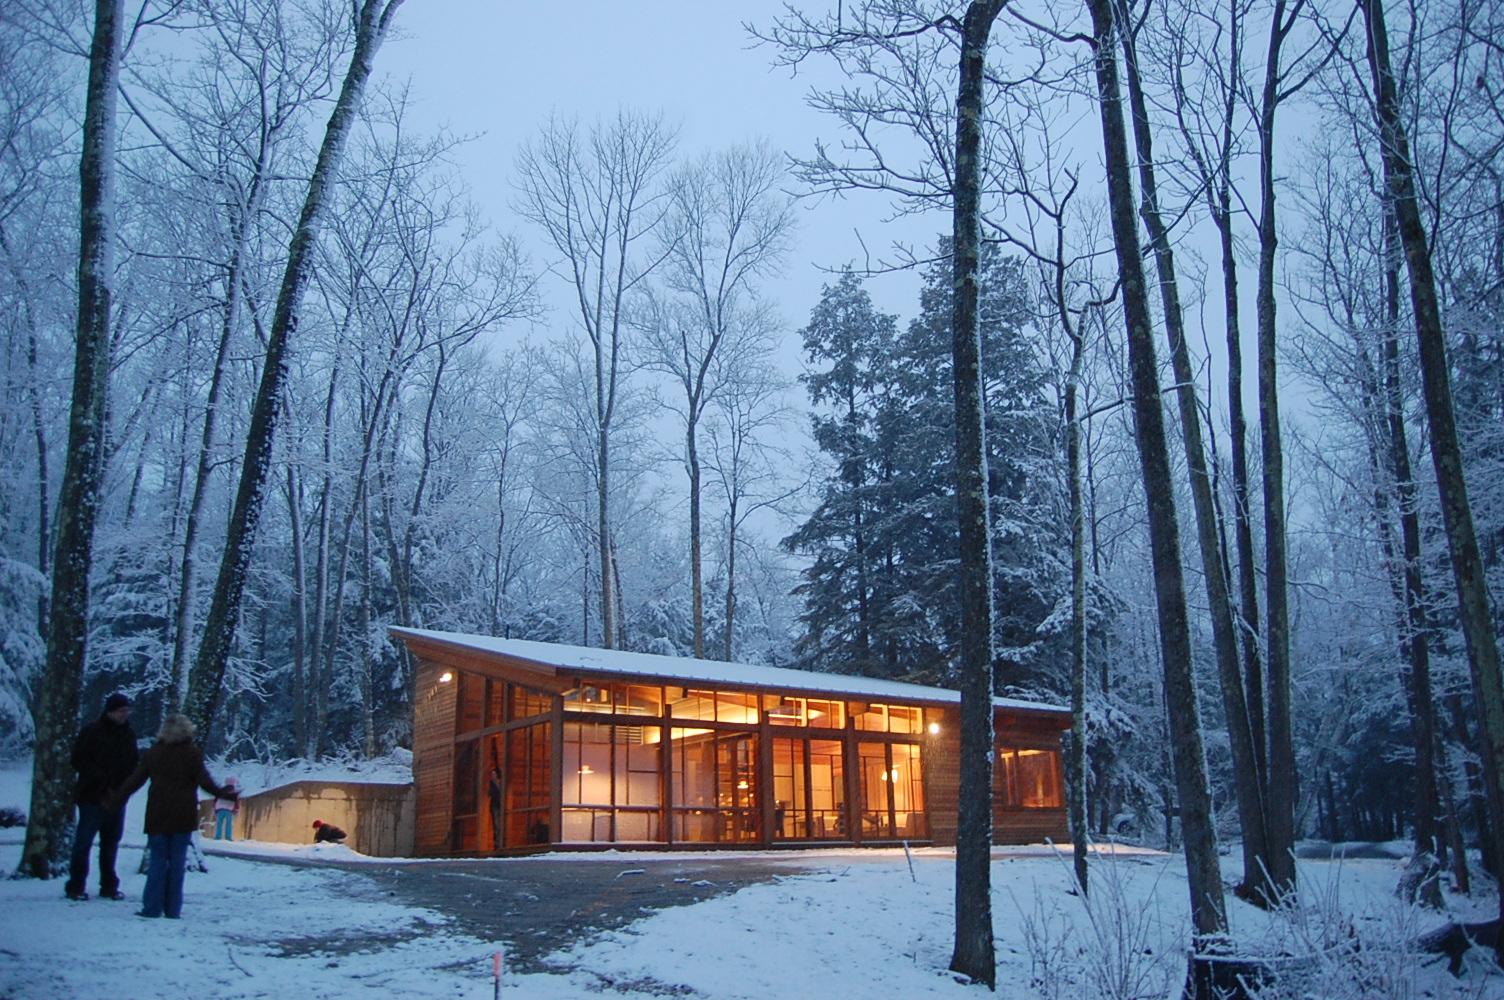 GB modern Cabin 1st snow!